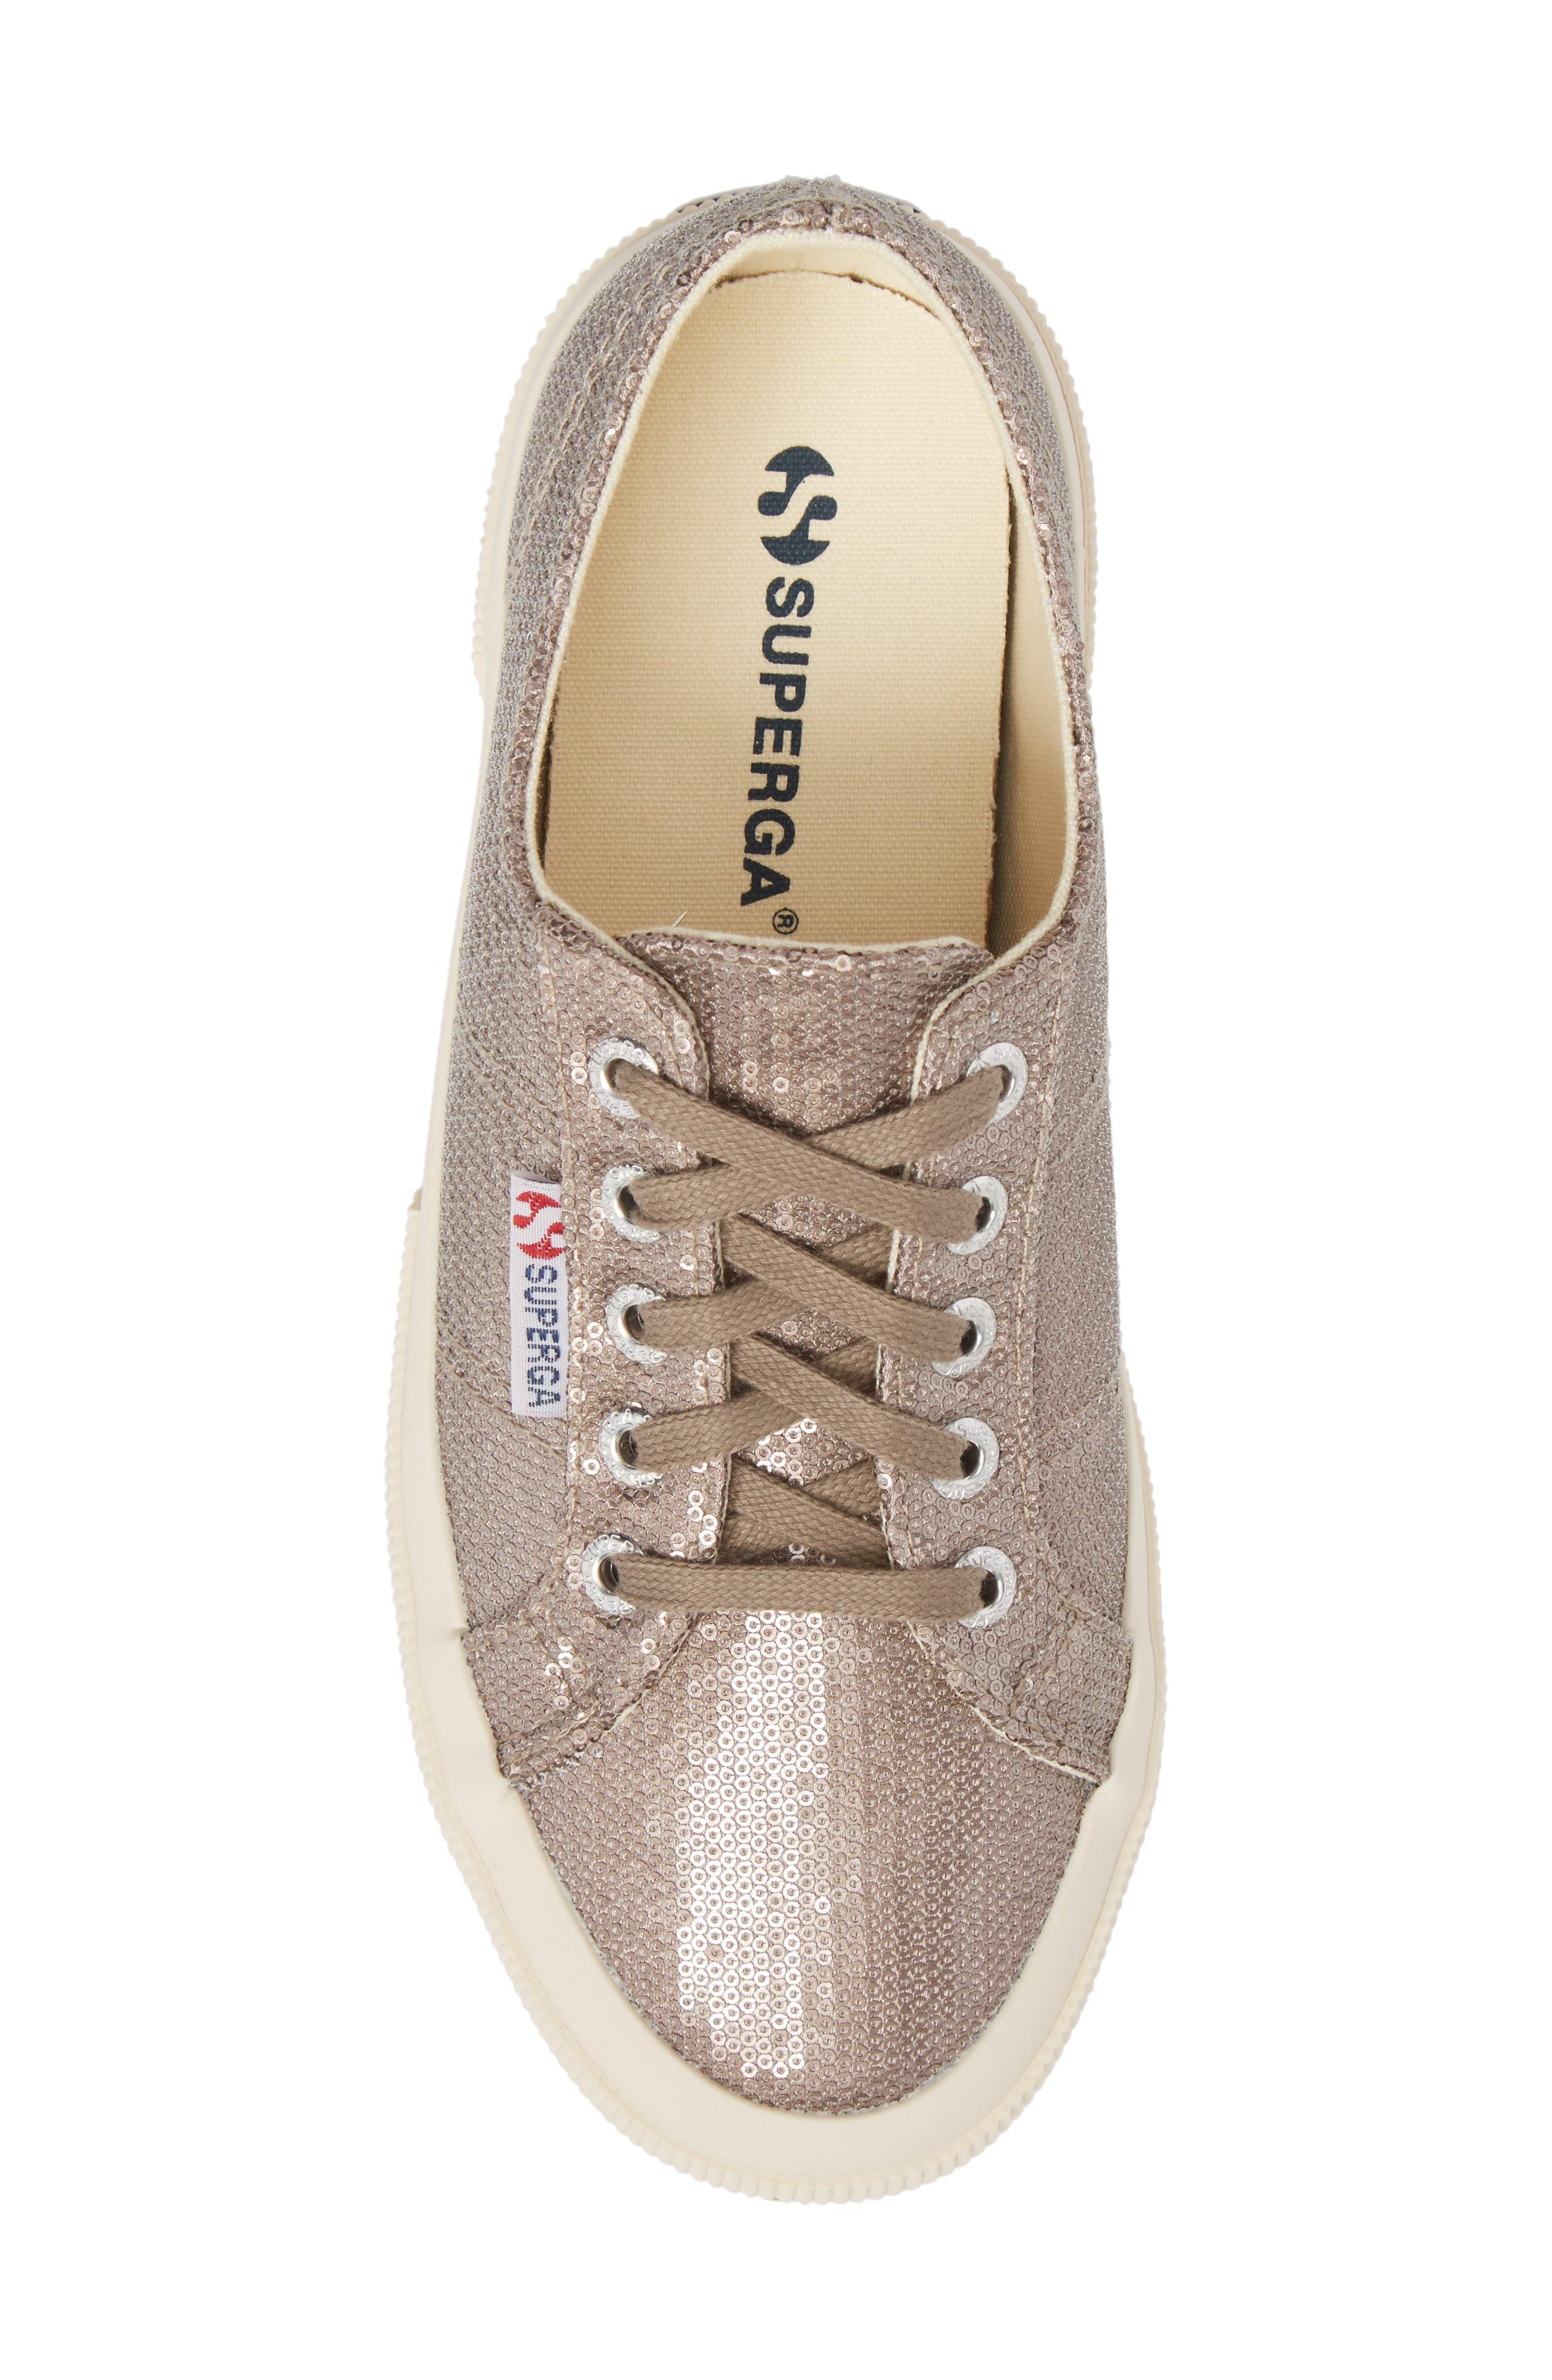 2750 Micro Sequin Sneaker,                             Alternate thumbnail 5, color,                             227